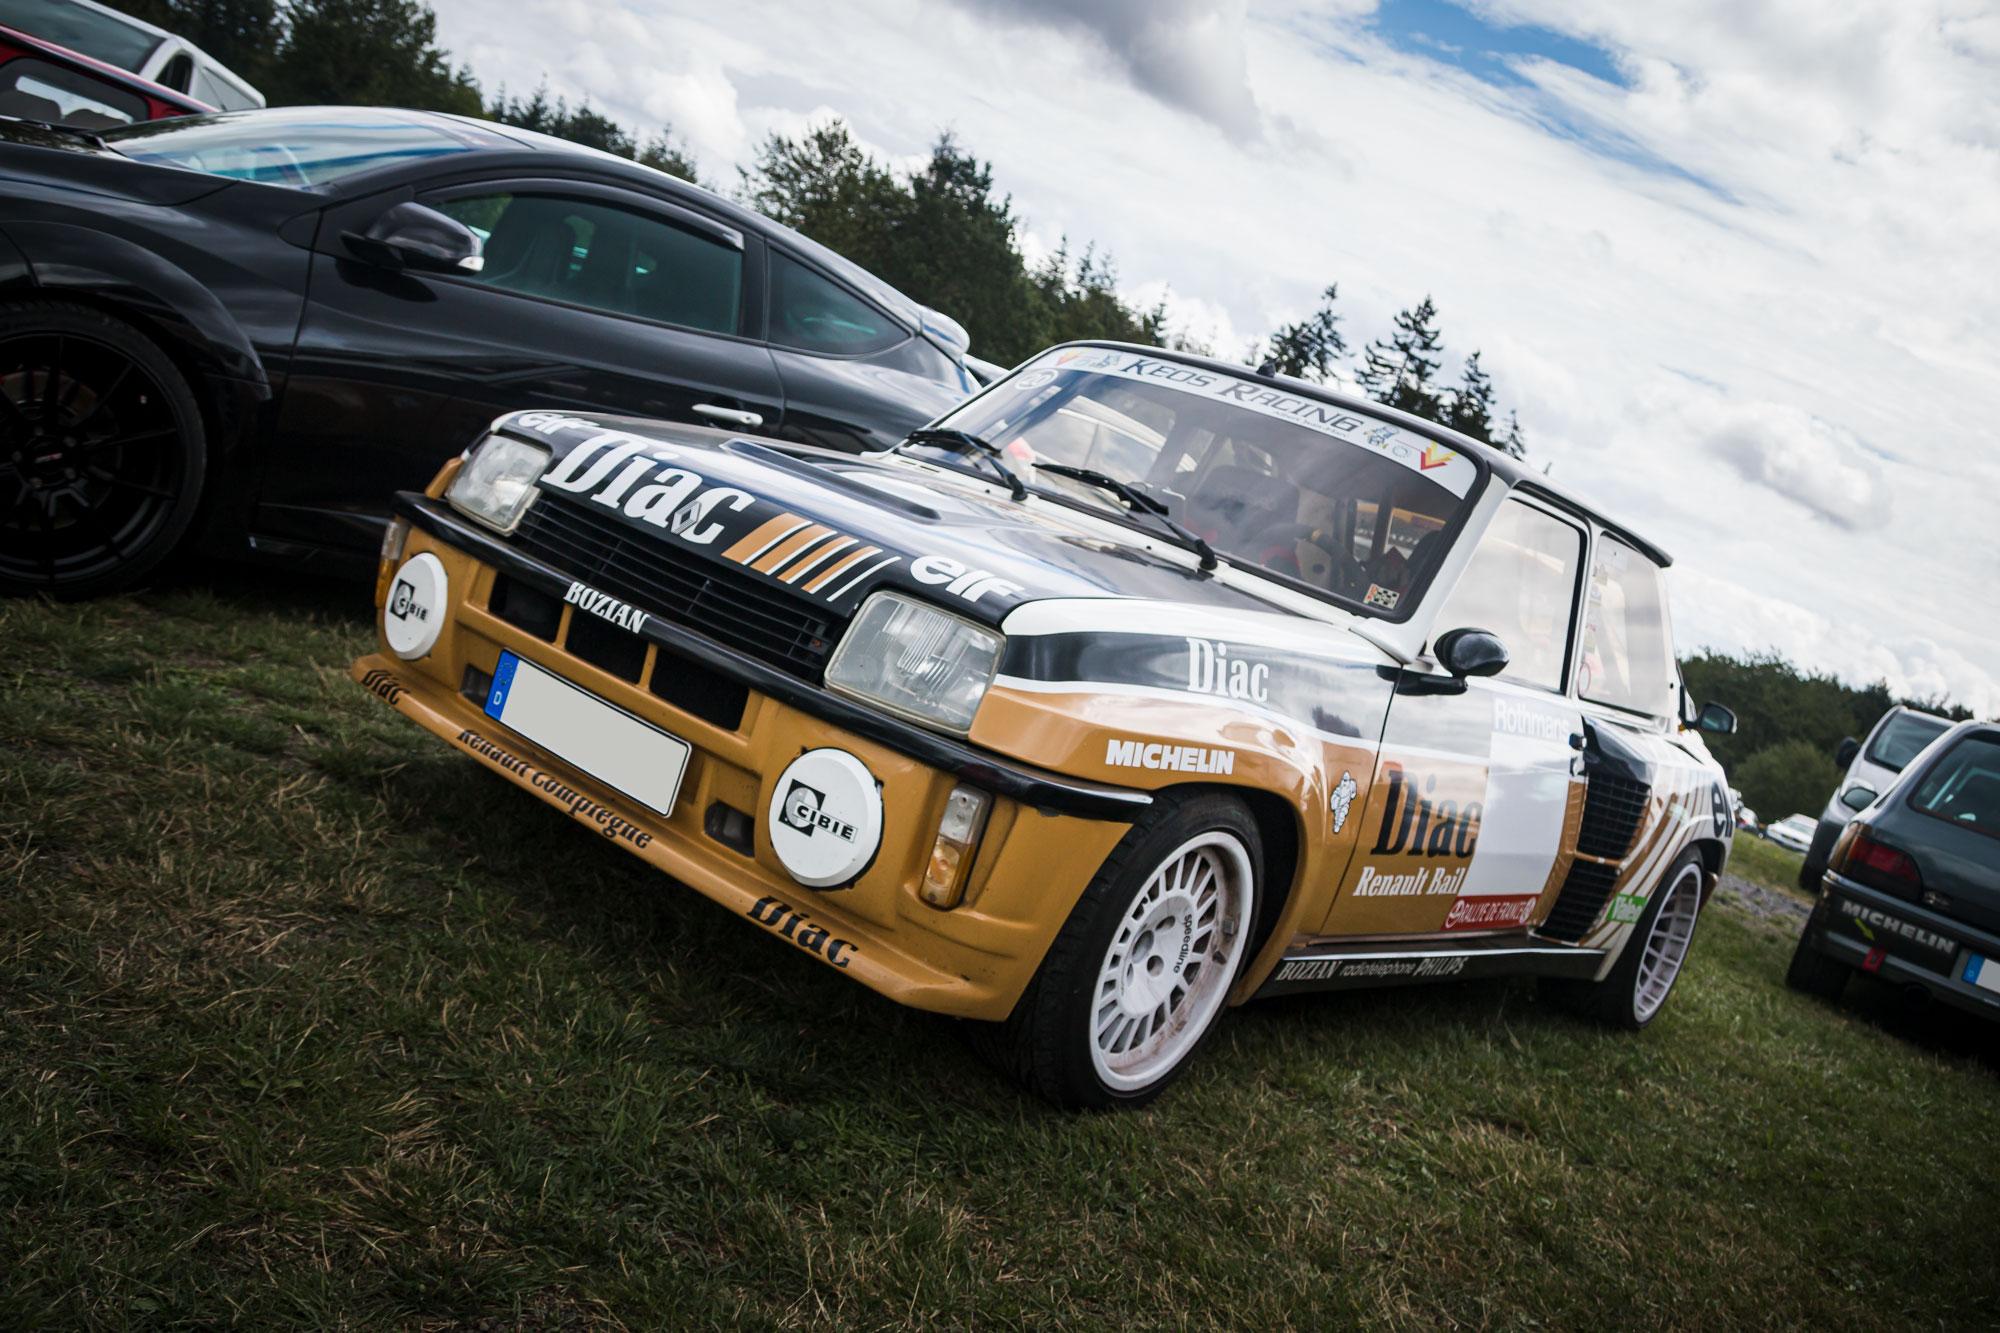 Renault 5 Turbo - D'ARC Sommerfest 2019 am Nürburgring